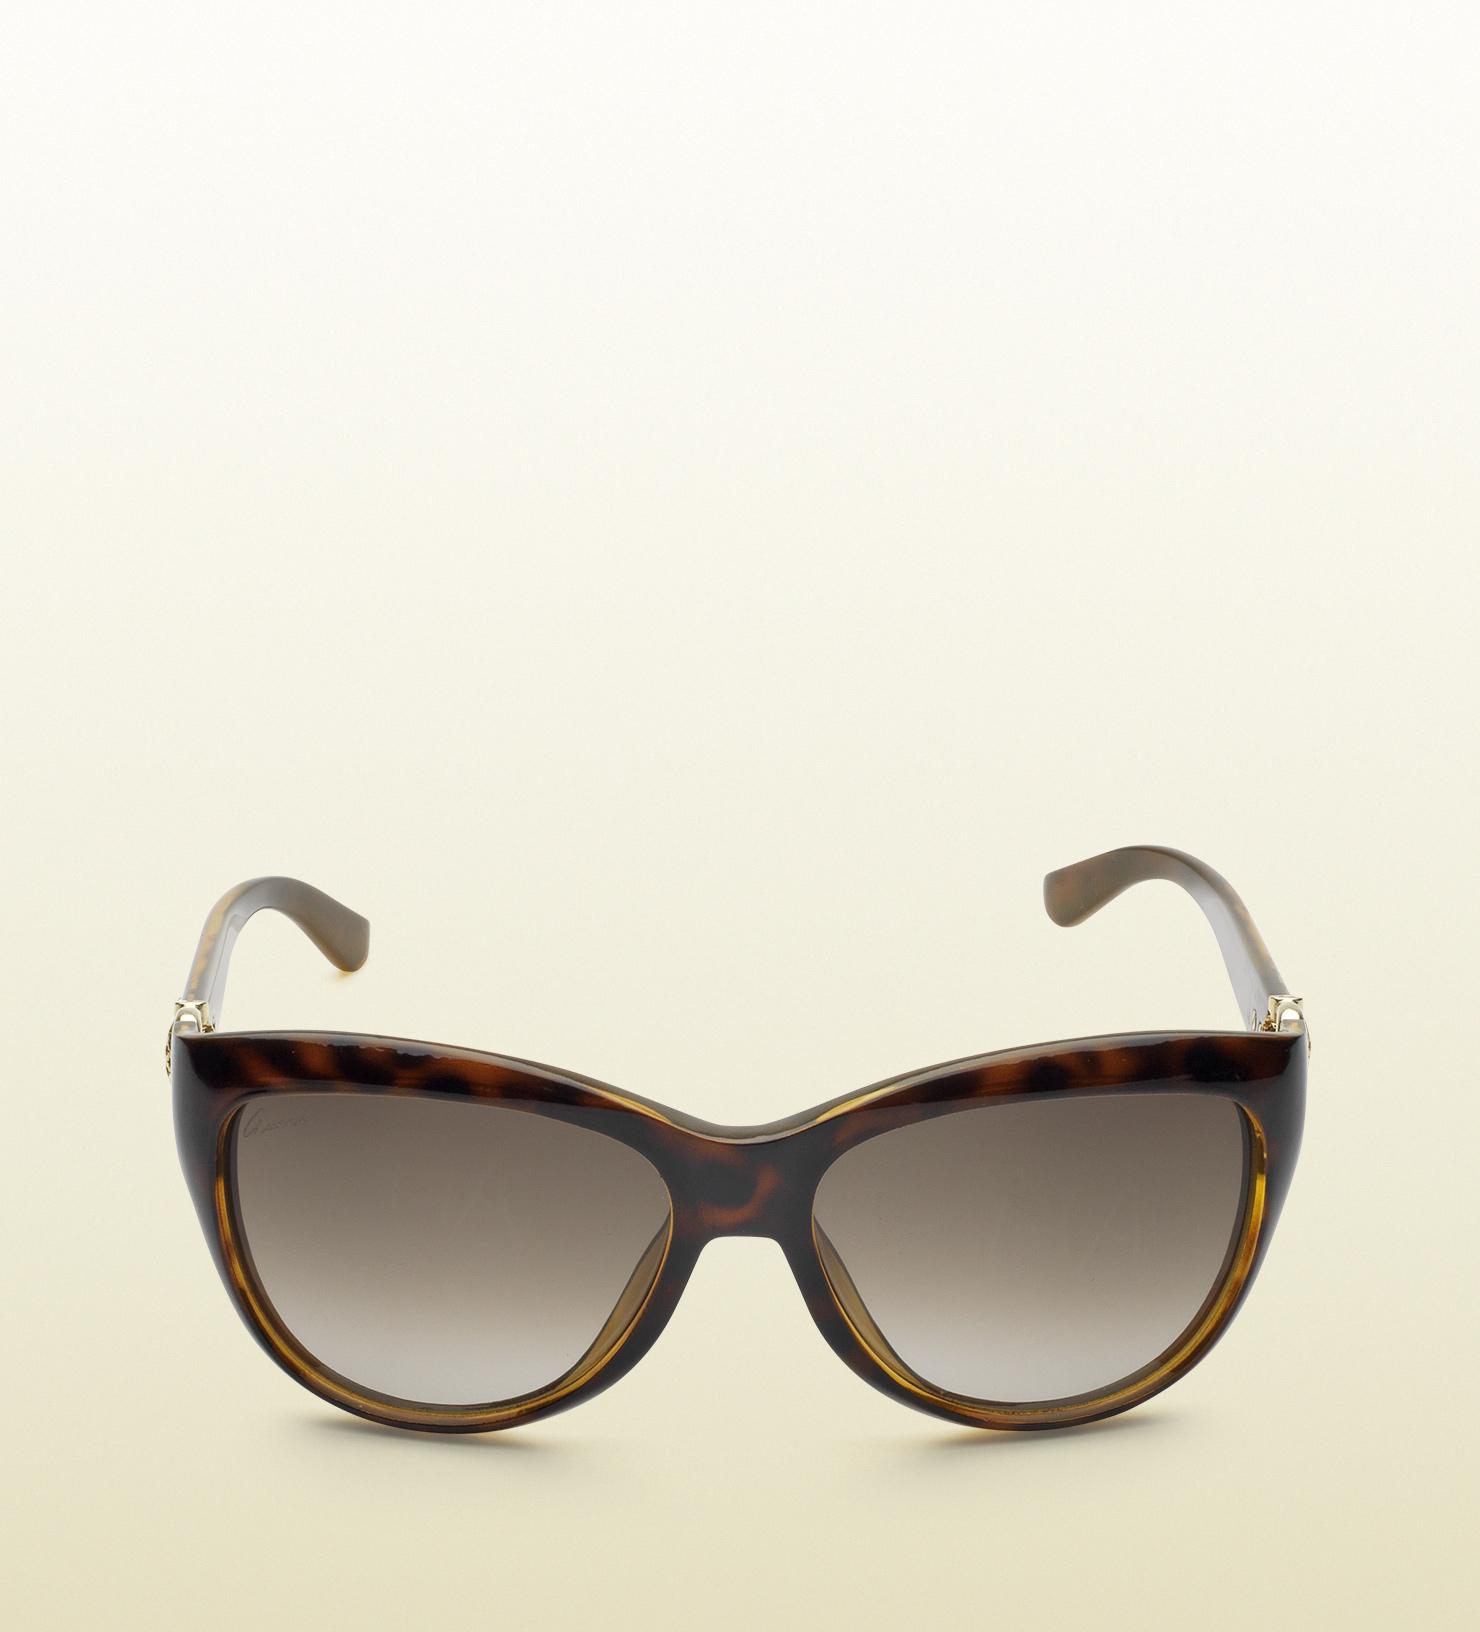 56c6ce7461e Lyst - Gucci Cat-eye Horsebit Optyl Sunglasses in Brown